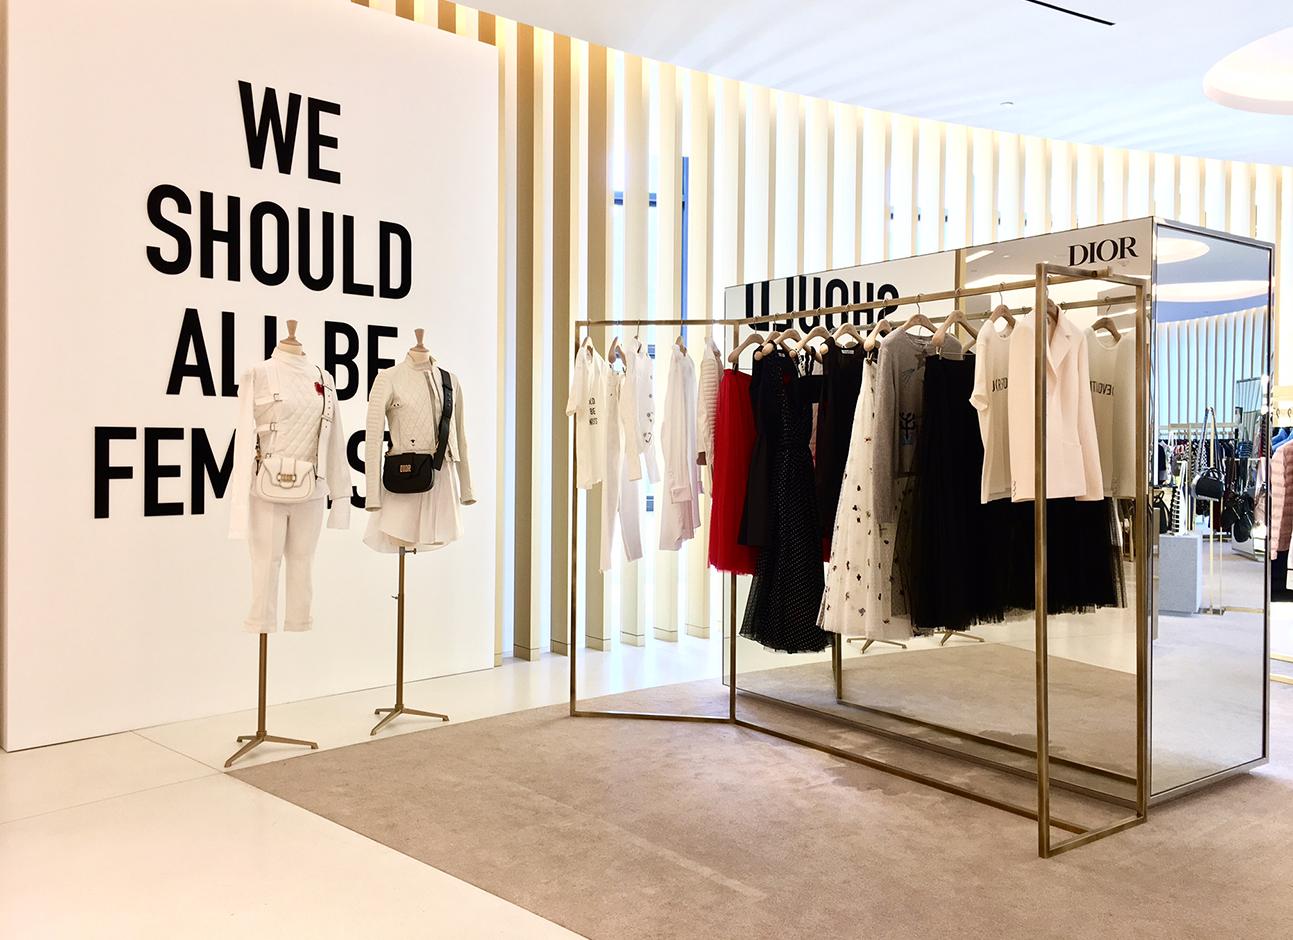 DW Dior pop up4 3.17.17.png